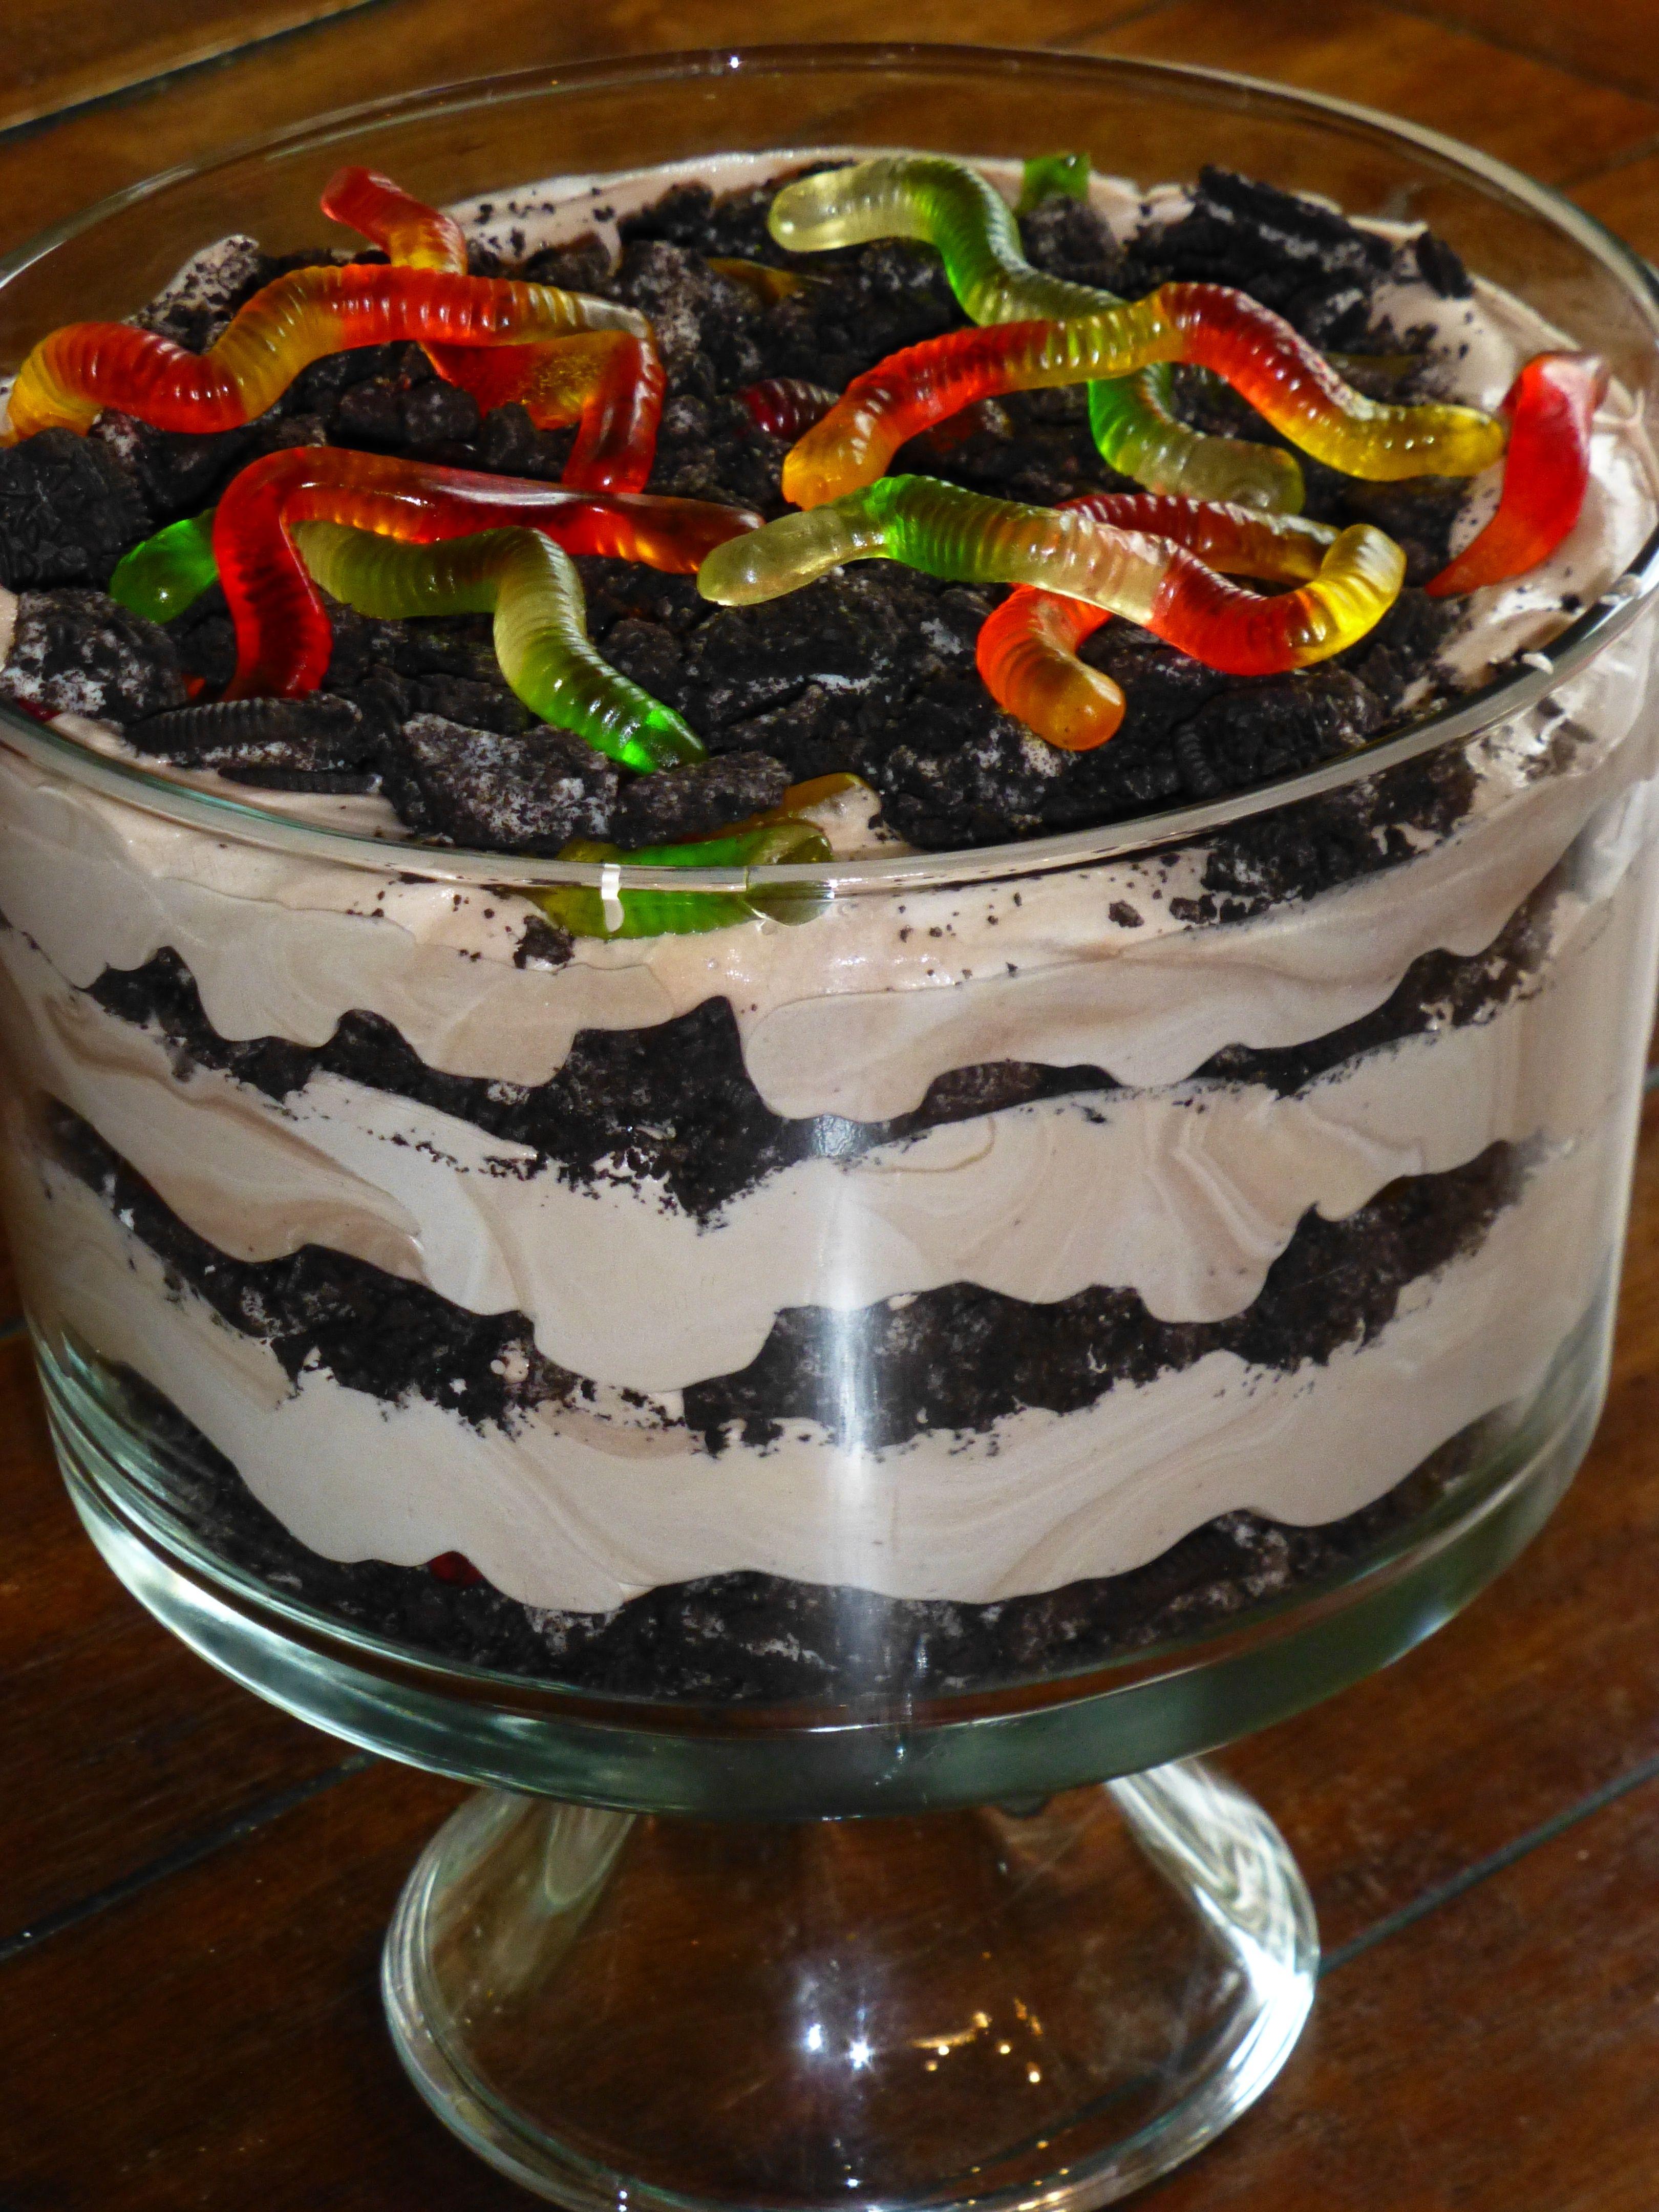 Dirt Cake Ideas For Halloween : The Best Dirt Cake Recipe Dirt cake, Cake and Recipes